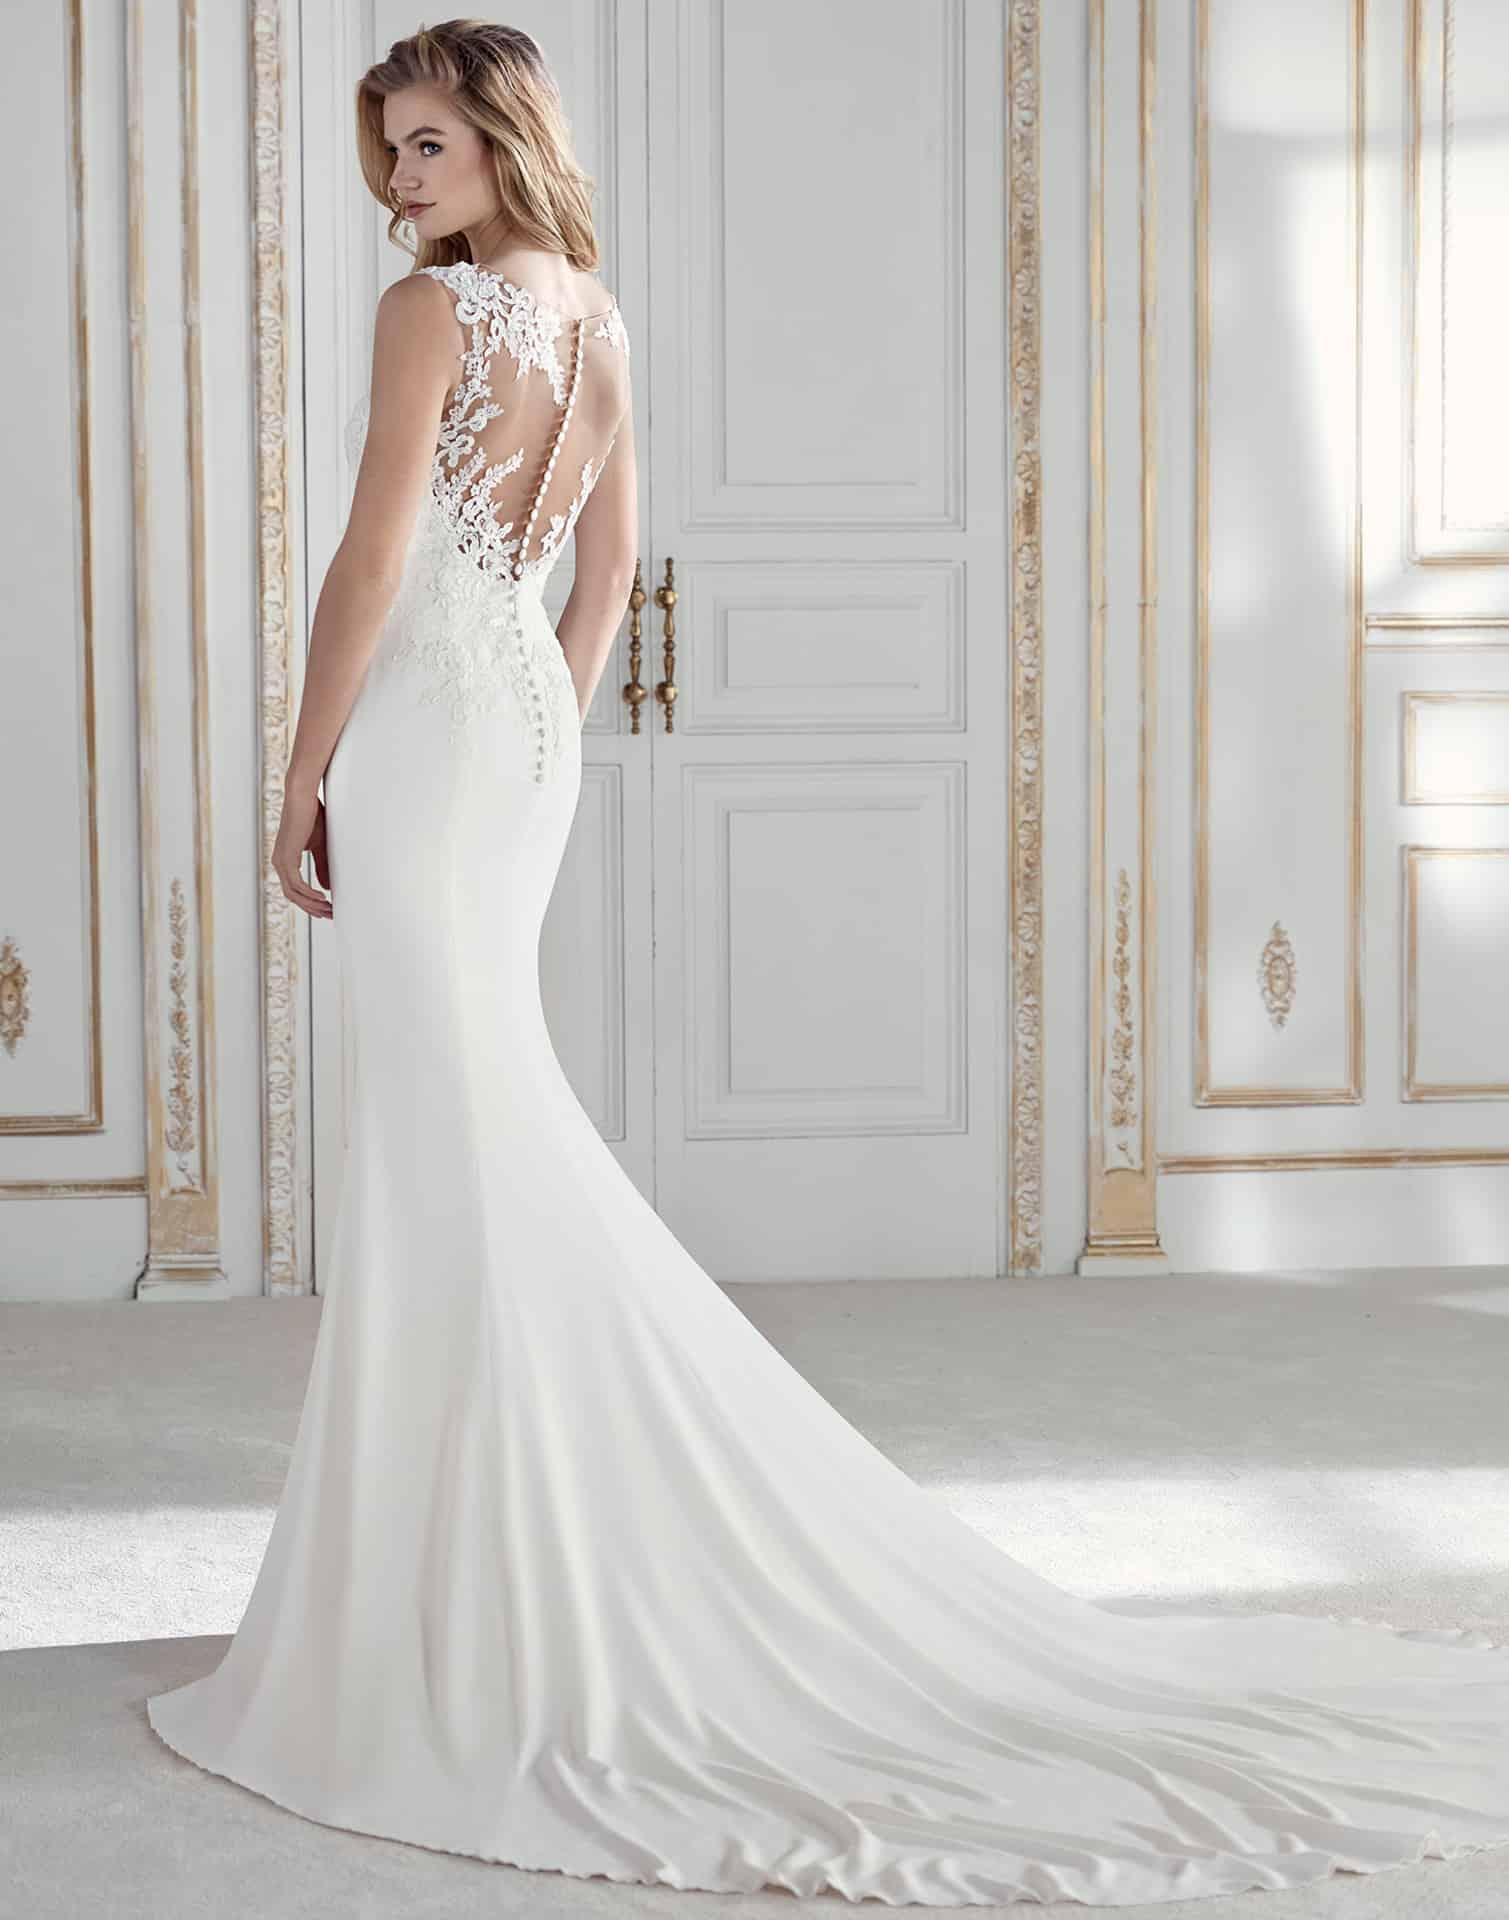 Wedding Dresses Gallery 40